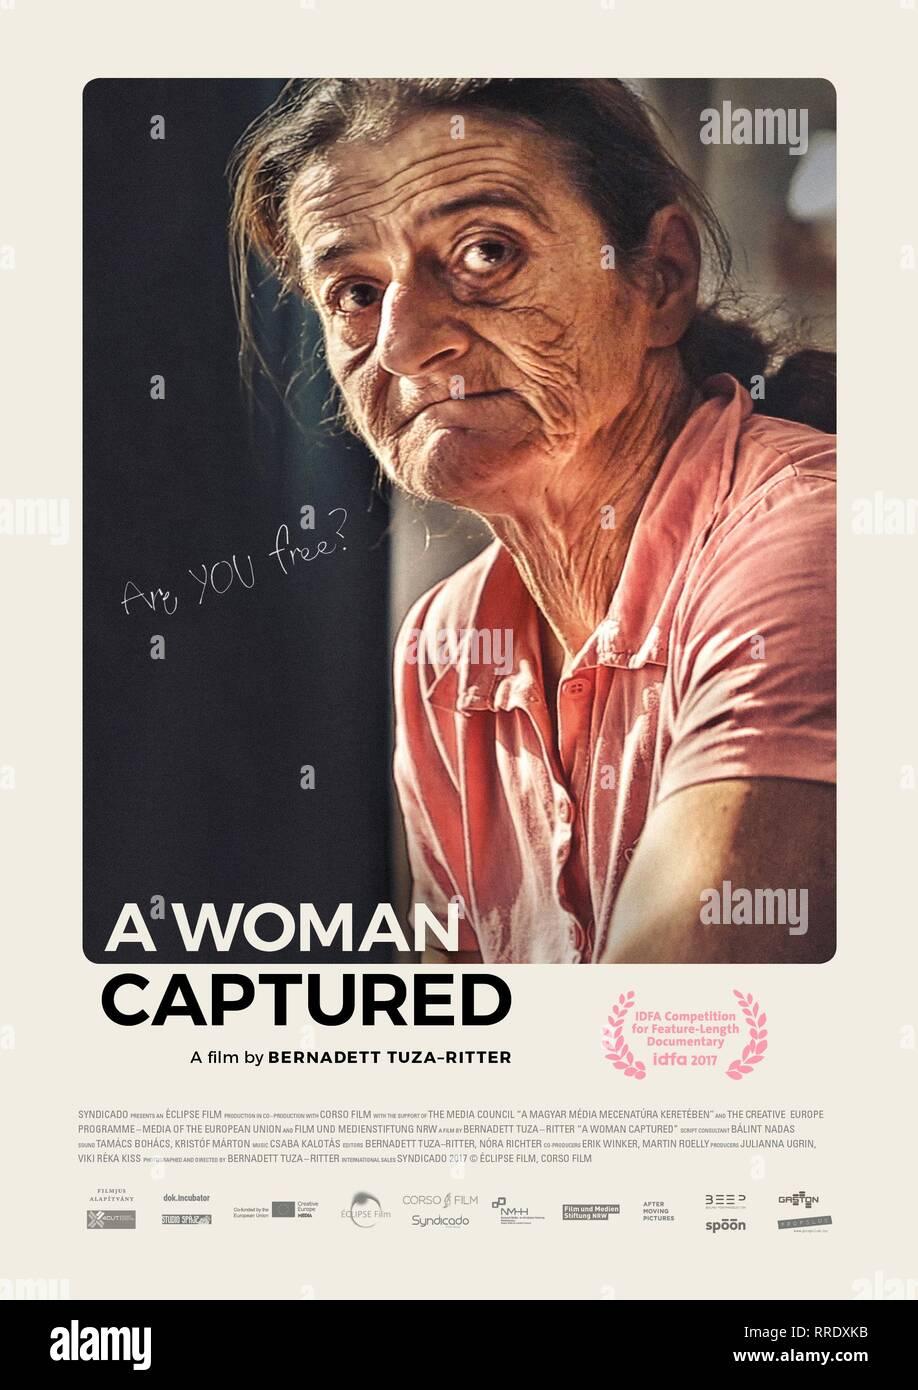 A WOMAN CAPTURED, MARISH POSTER, 2017 - Stock Image